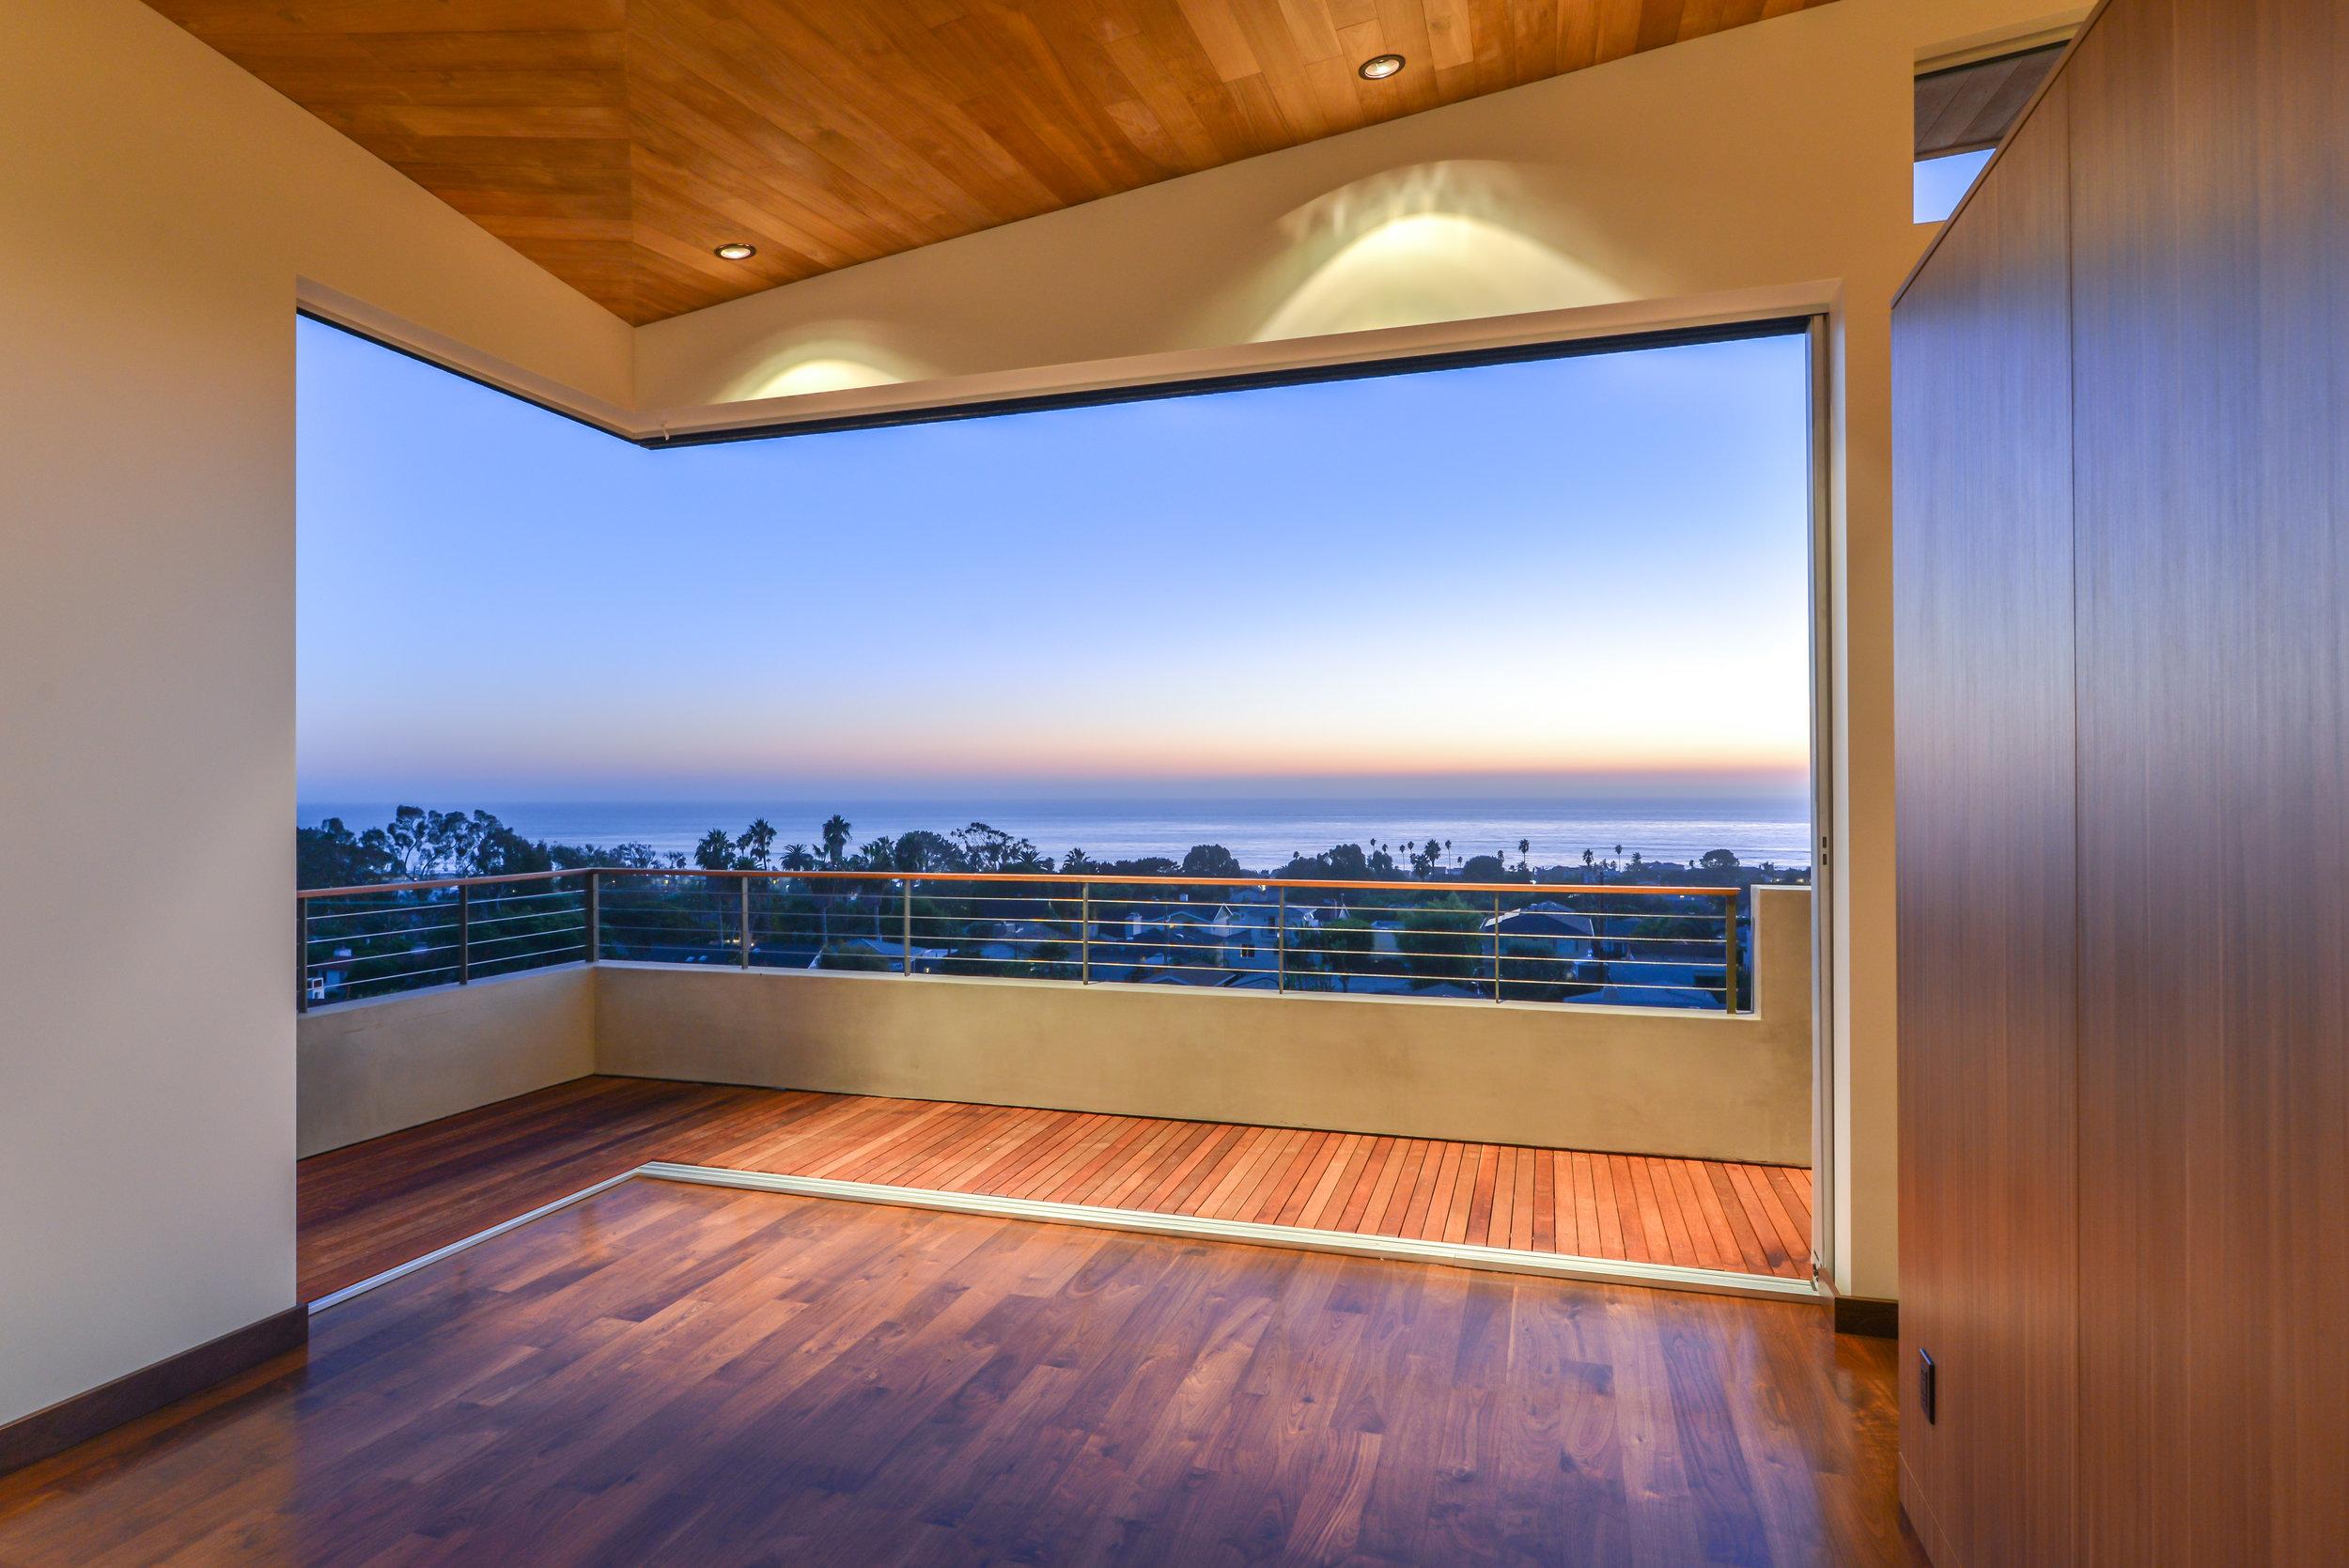 S.E.A.-Studio-Environmental-Architecture-David-Hertz-FAIA-Linda-Rosa-House-La-Jolla-San-Diego-sustainable-regenerative-restorative-design-modern-residential-mindful-garden-panoramic-ocean-view-open-concept-california-dream-2.jpg